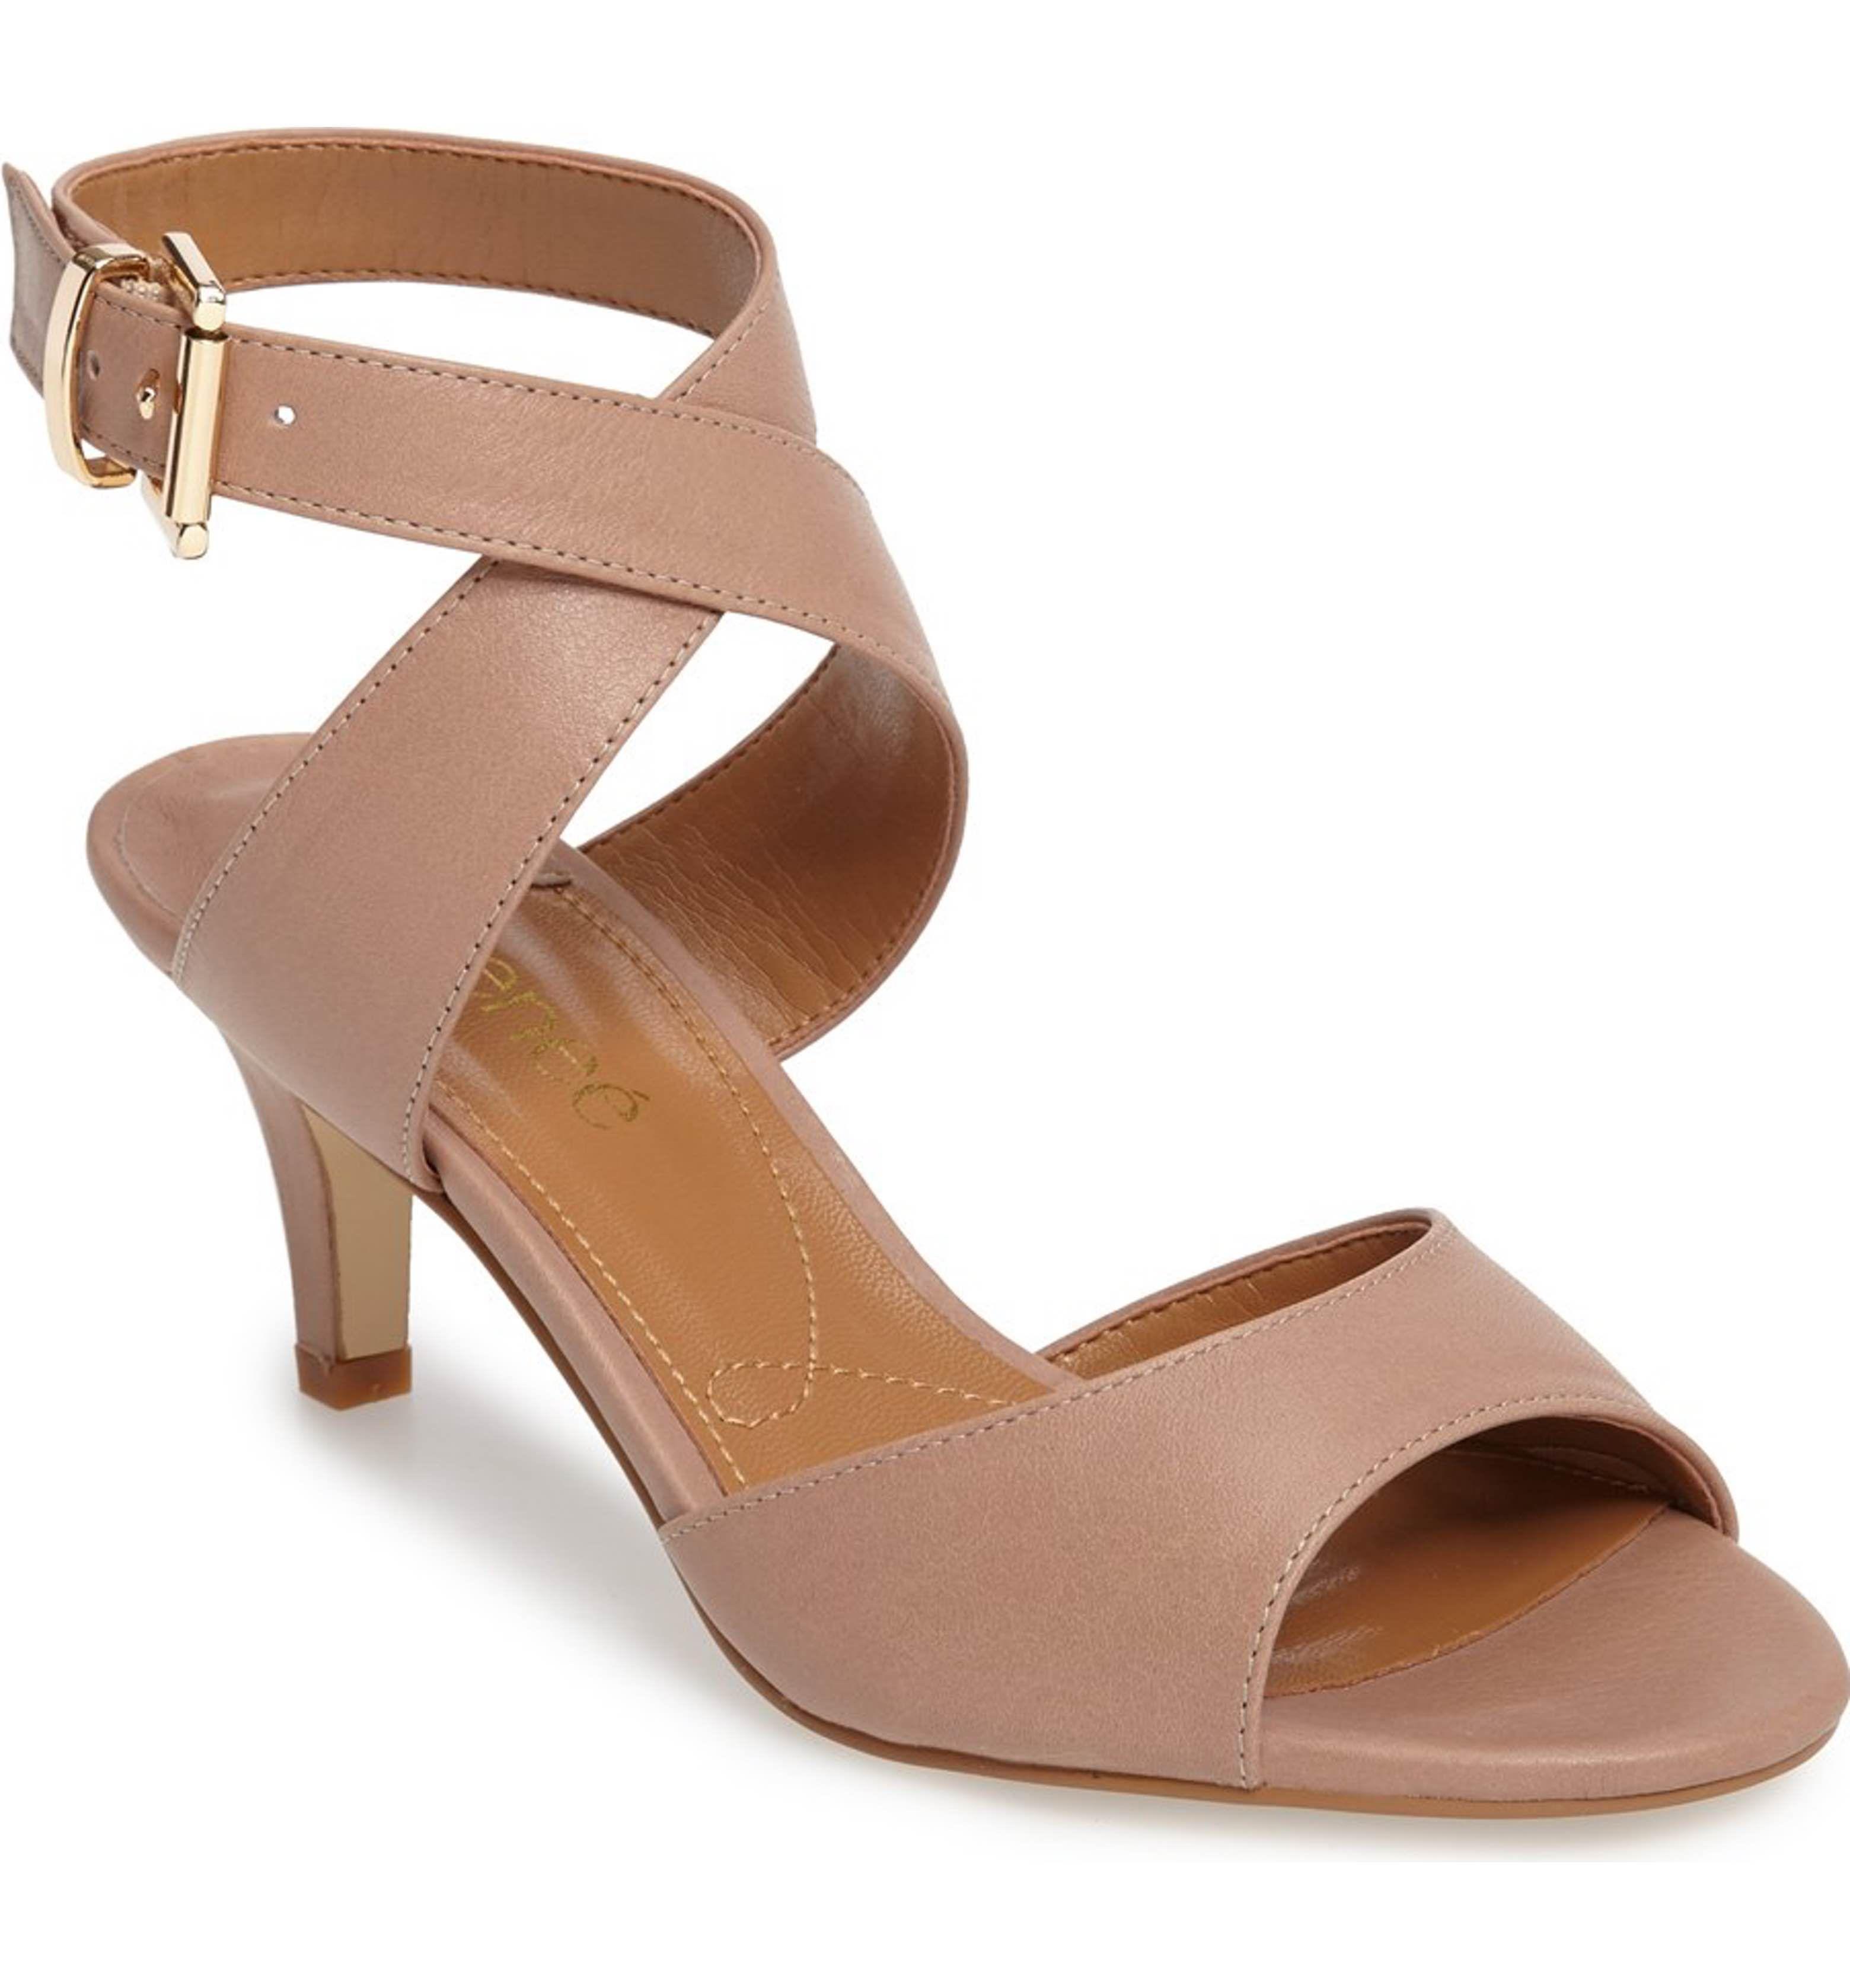 Main Image - J. Reneé 'Soncino' Ankle Strap Sandal (Women)